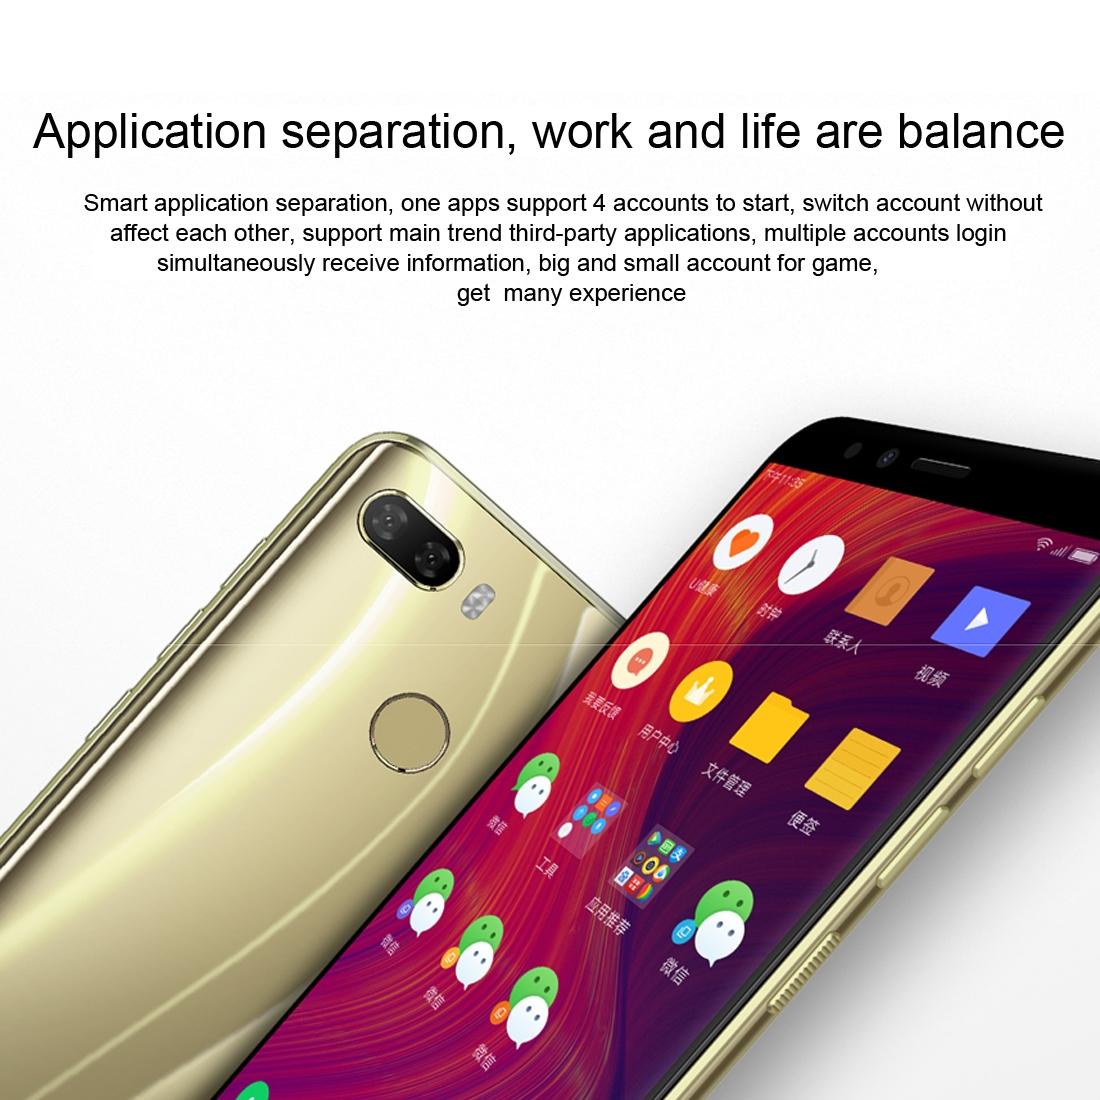 i.ibb.co/pPCsDwk/Smartphone-3-GB-32-GB-Jogo-Lenovo-K5-Play-Azul-12.jpg